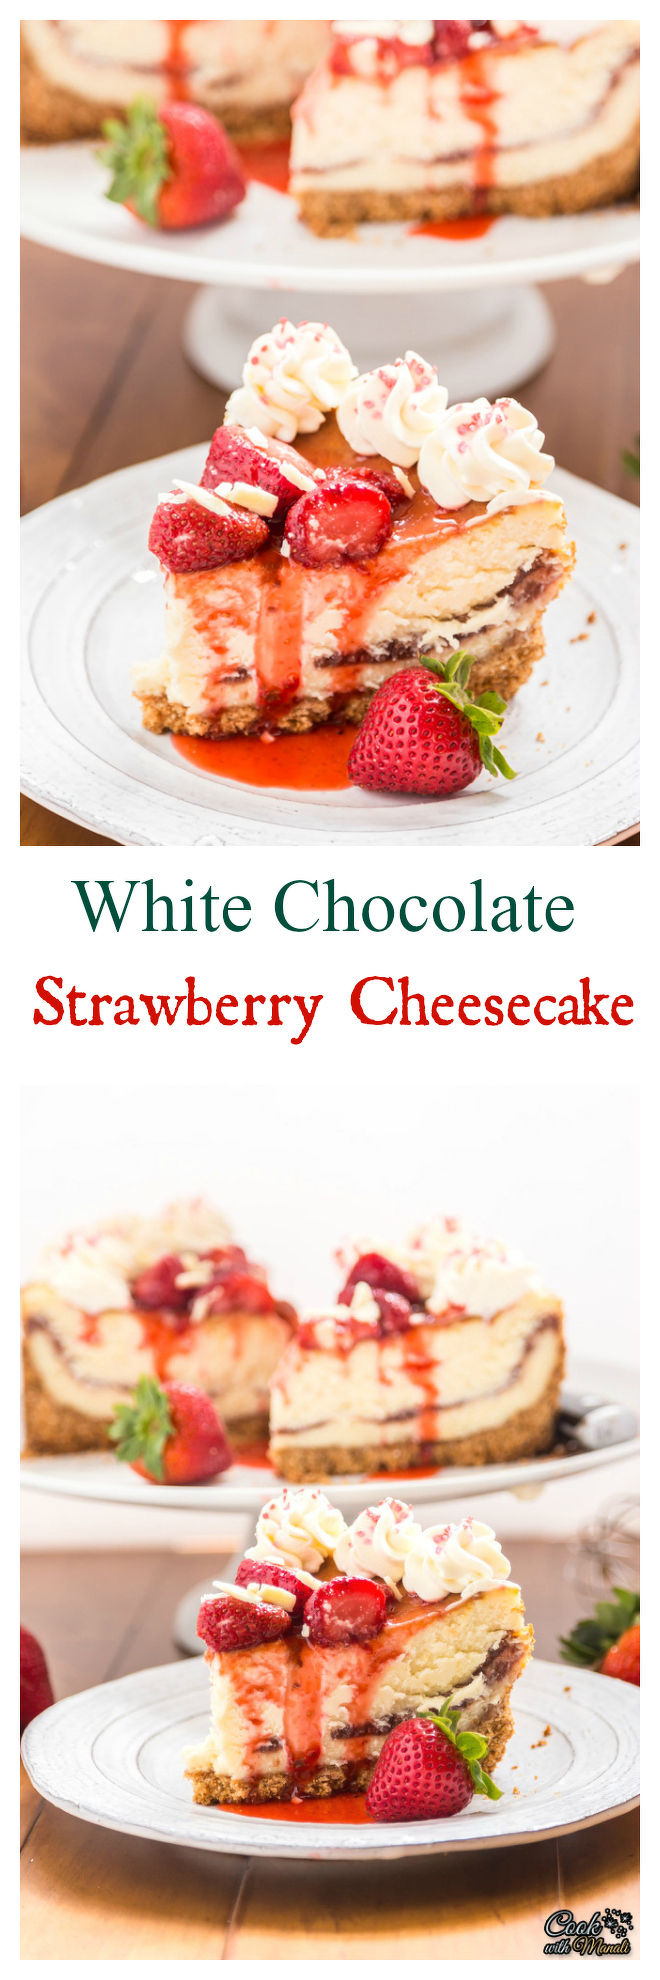 White Chocolate Strawberry Cheesecake Collage-nocwm